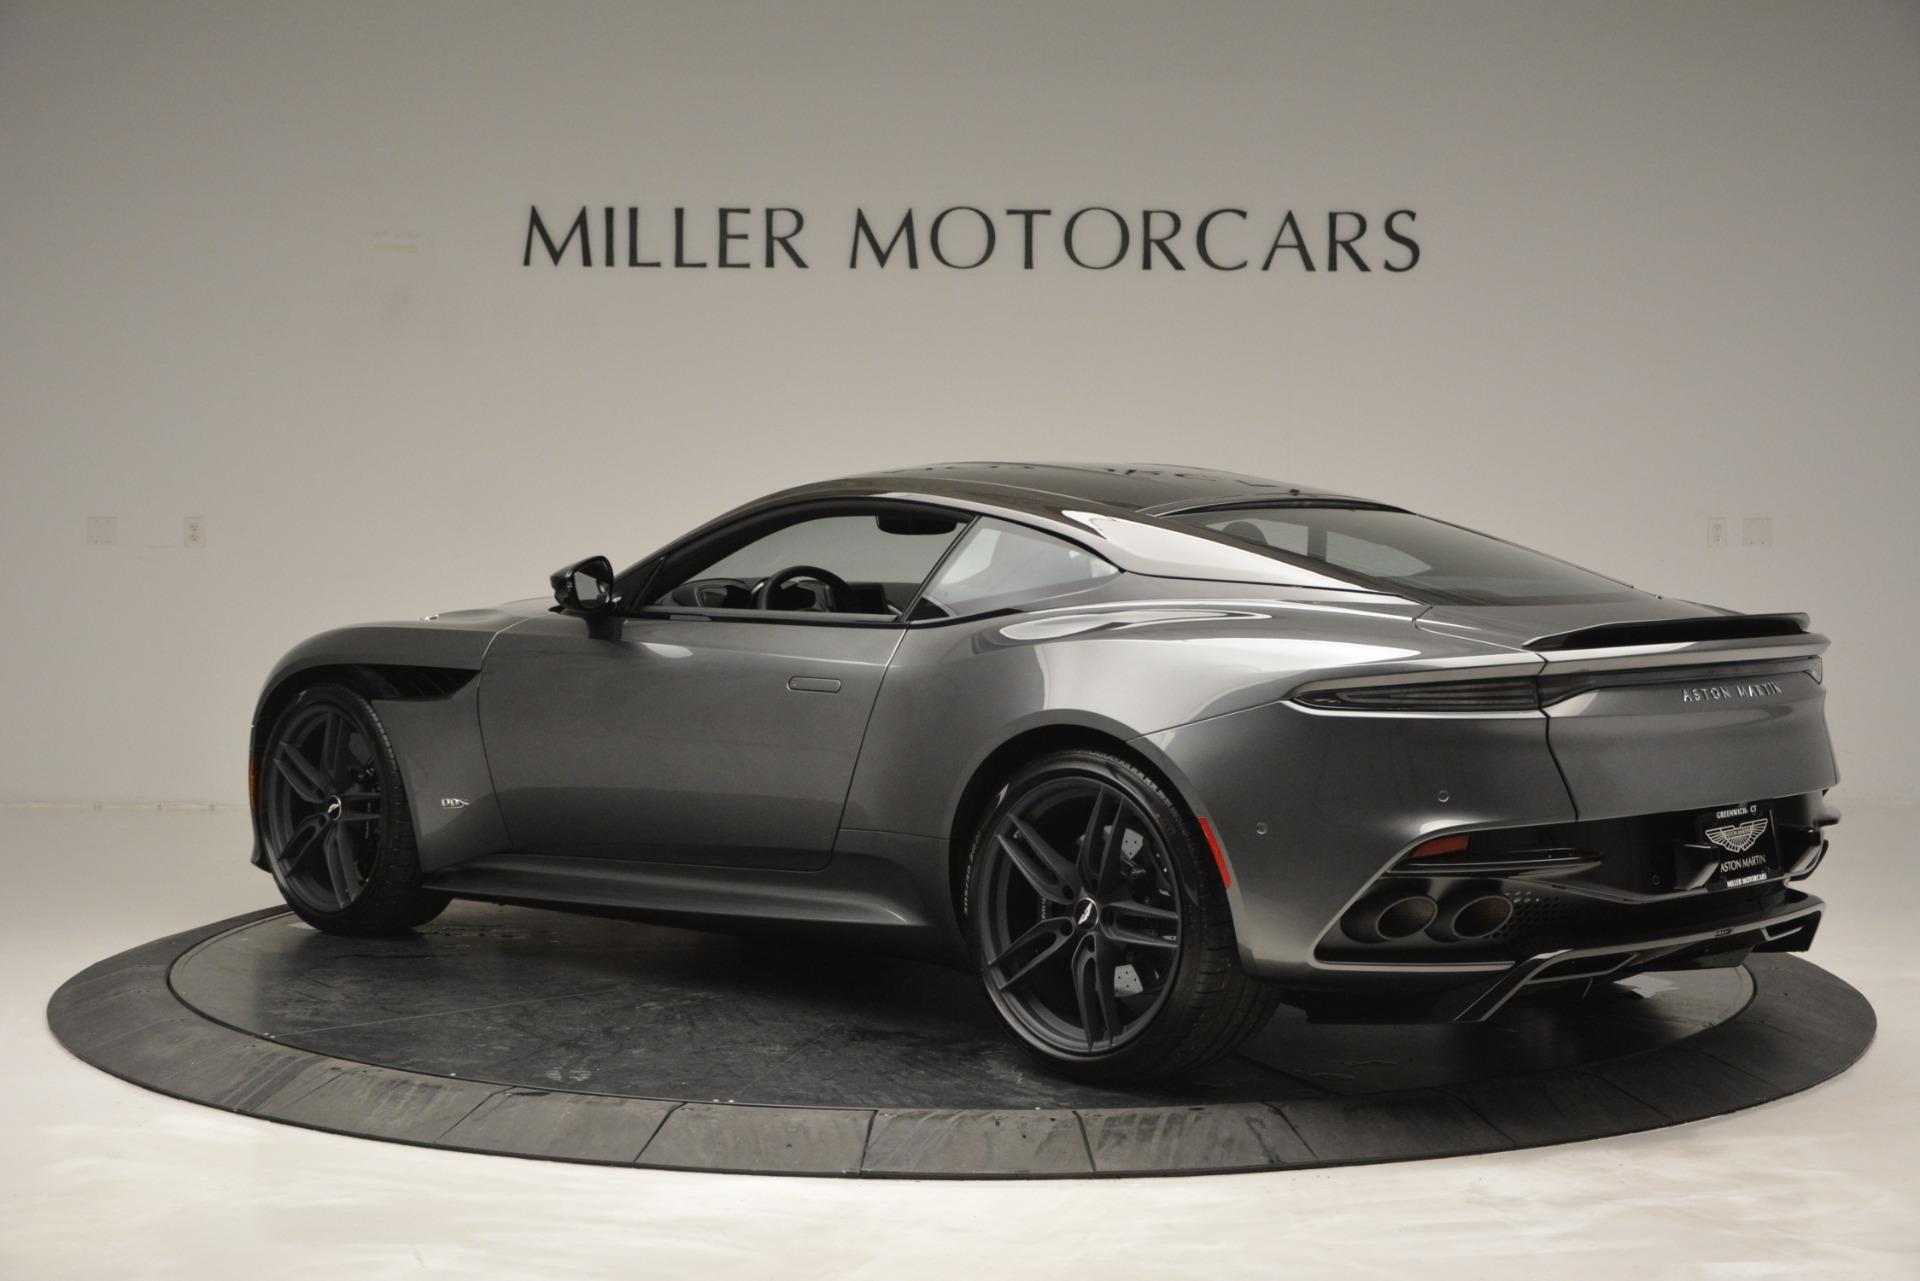 Used 2019 Aston Martin DBS Superleggera Coupe For Sale In Greenwich, CT 2917_p4